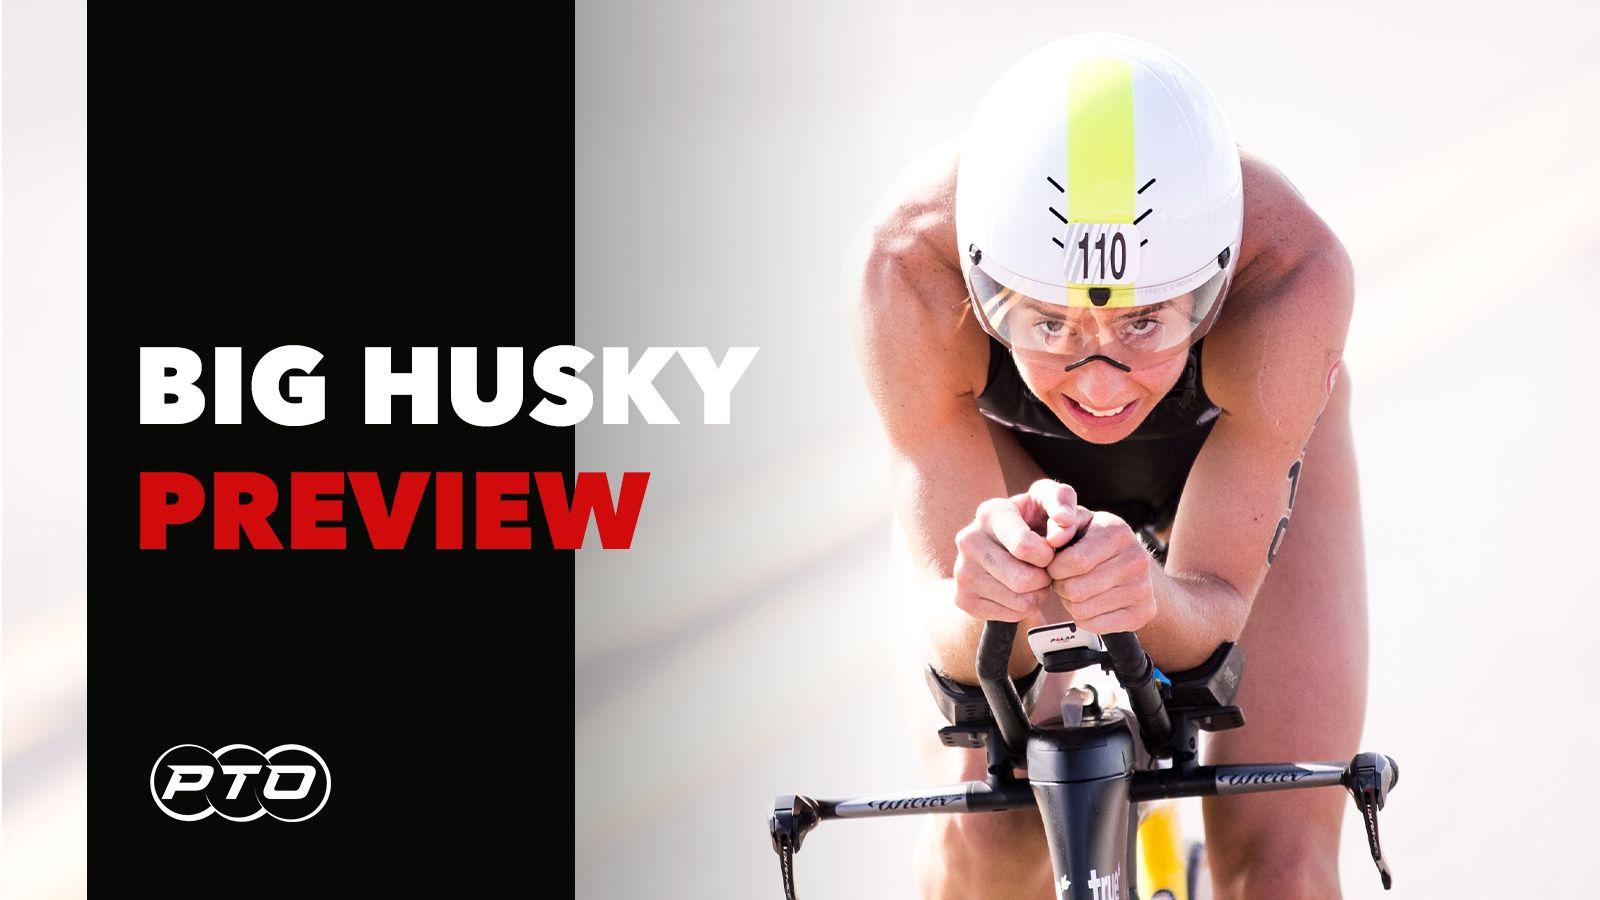 Big Husky Triathlon: Start time, live stream and PTO stars in action